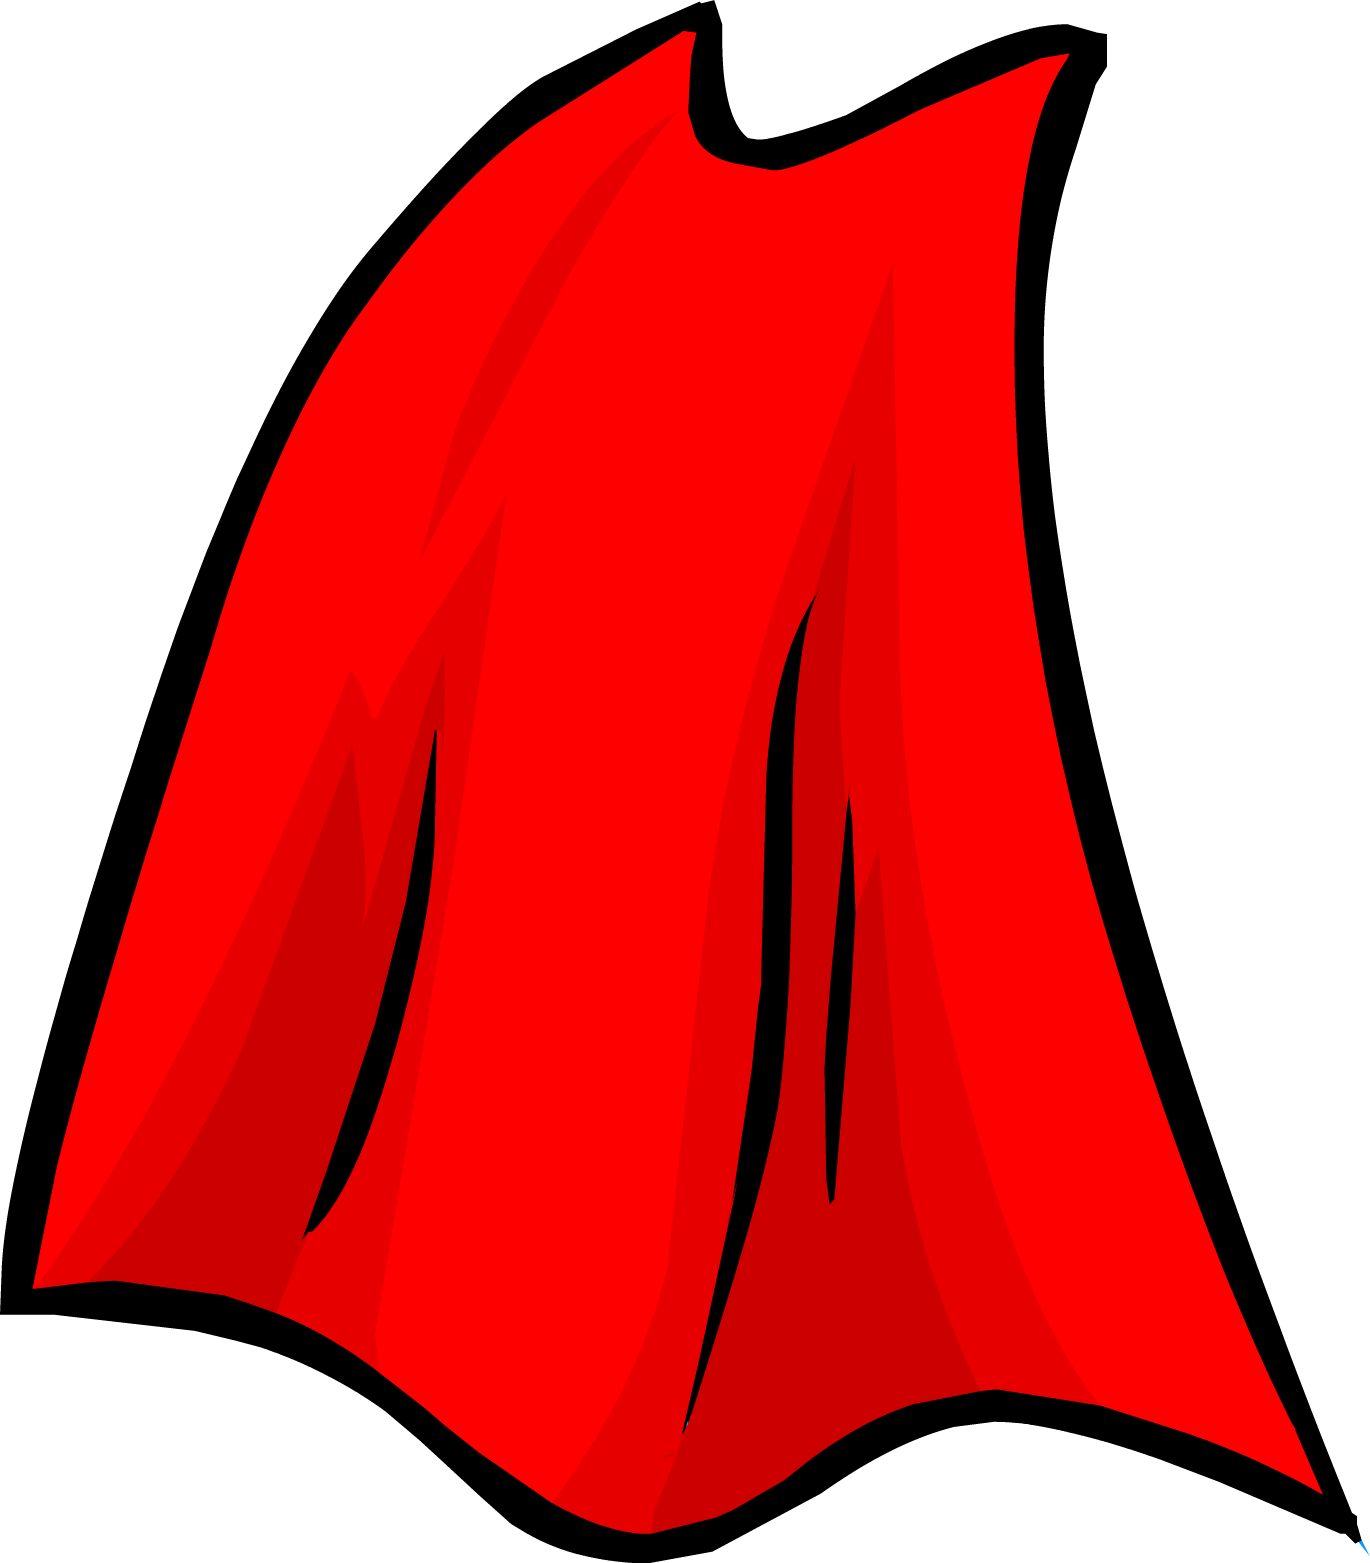 Capa Roja (ID 301)